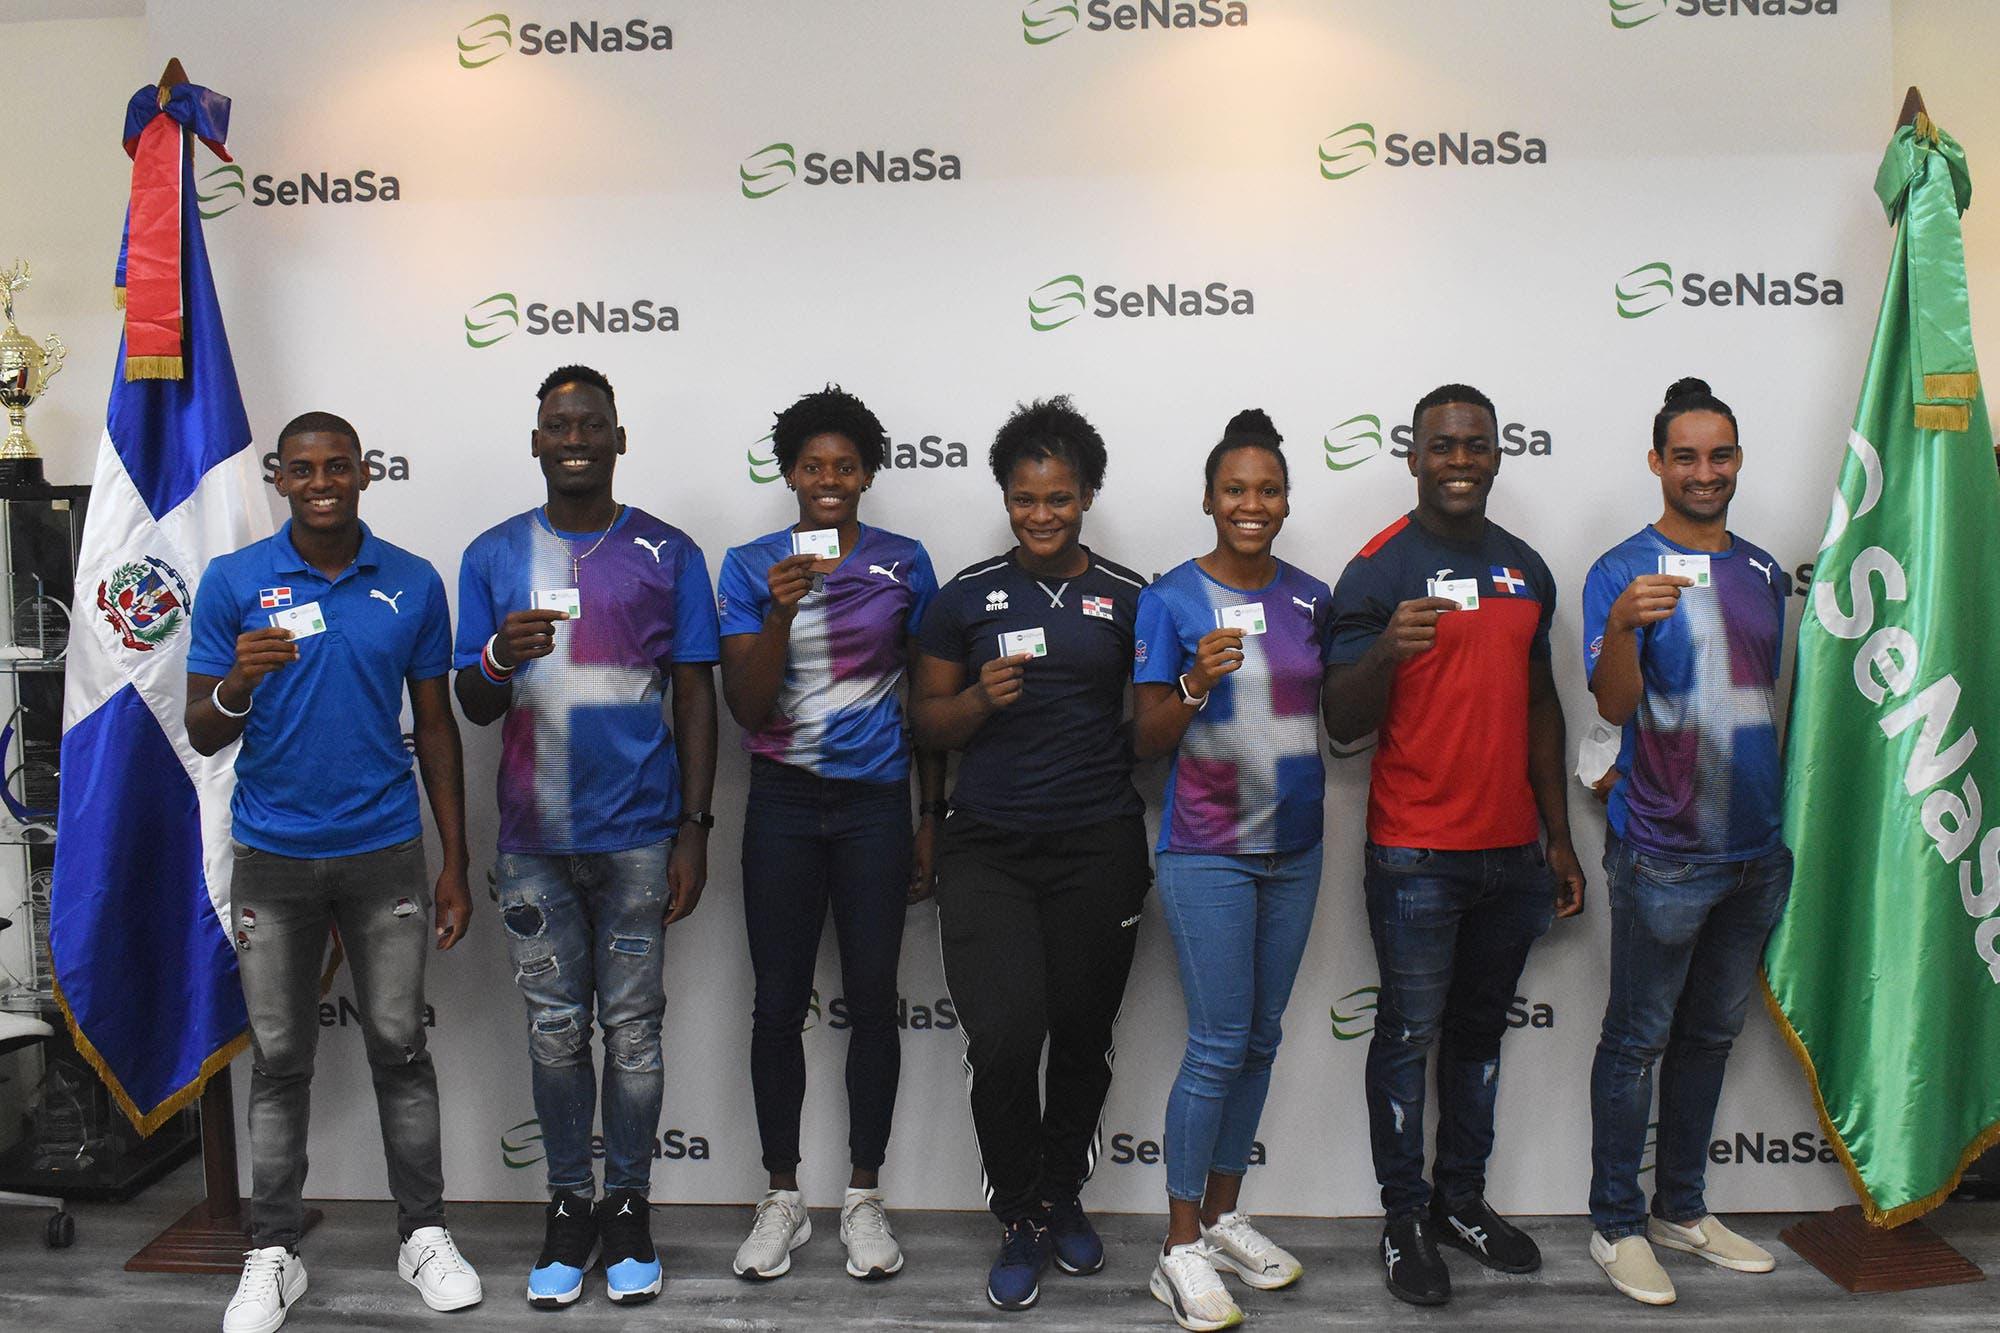 Medallistas olímpicos reciben seguro Premium de SeNaSa